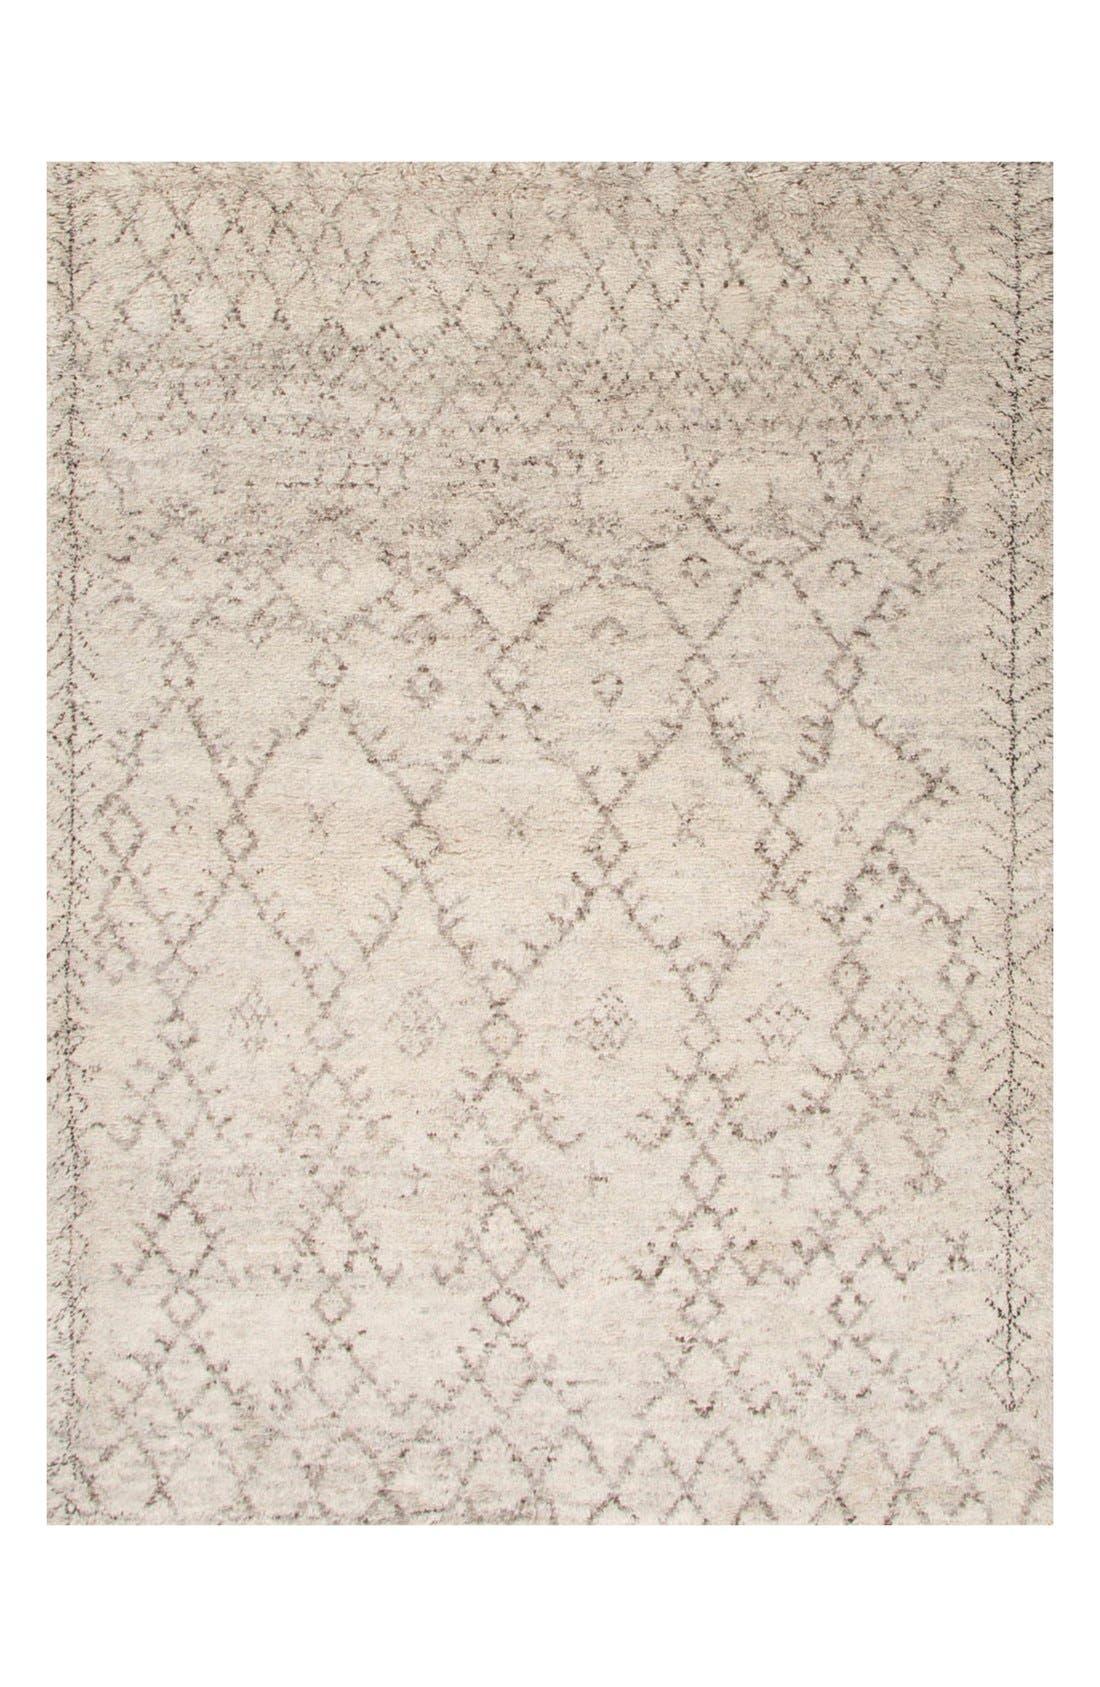 'Zola' Wool Area Rug,                         Main,                         color, IVORY/ GREY